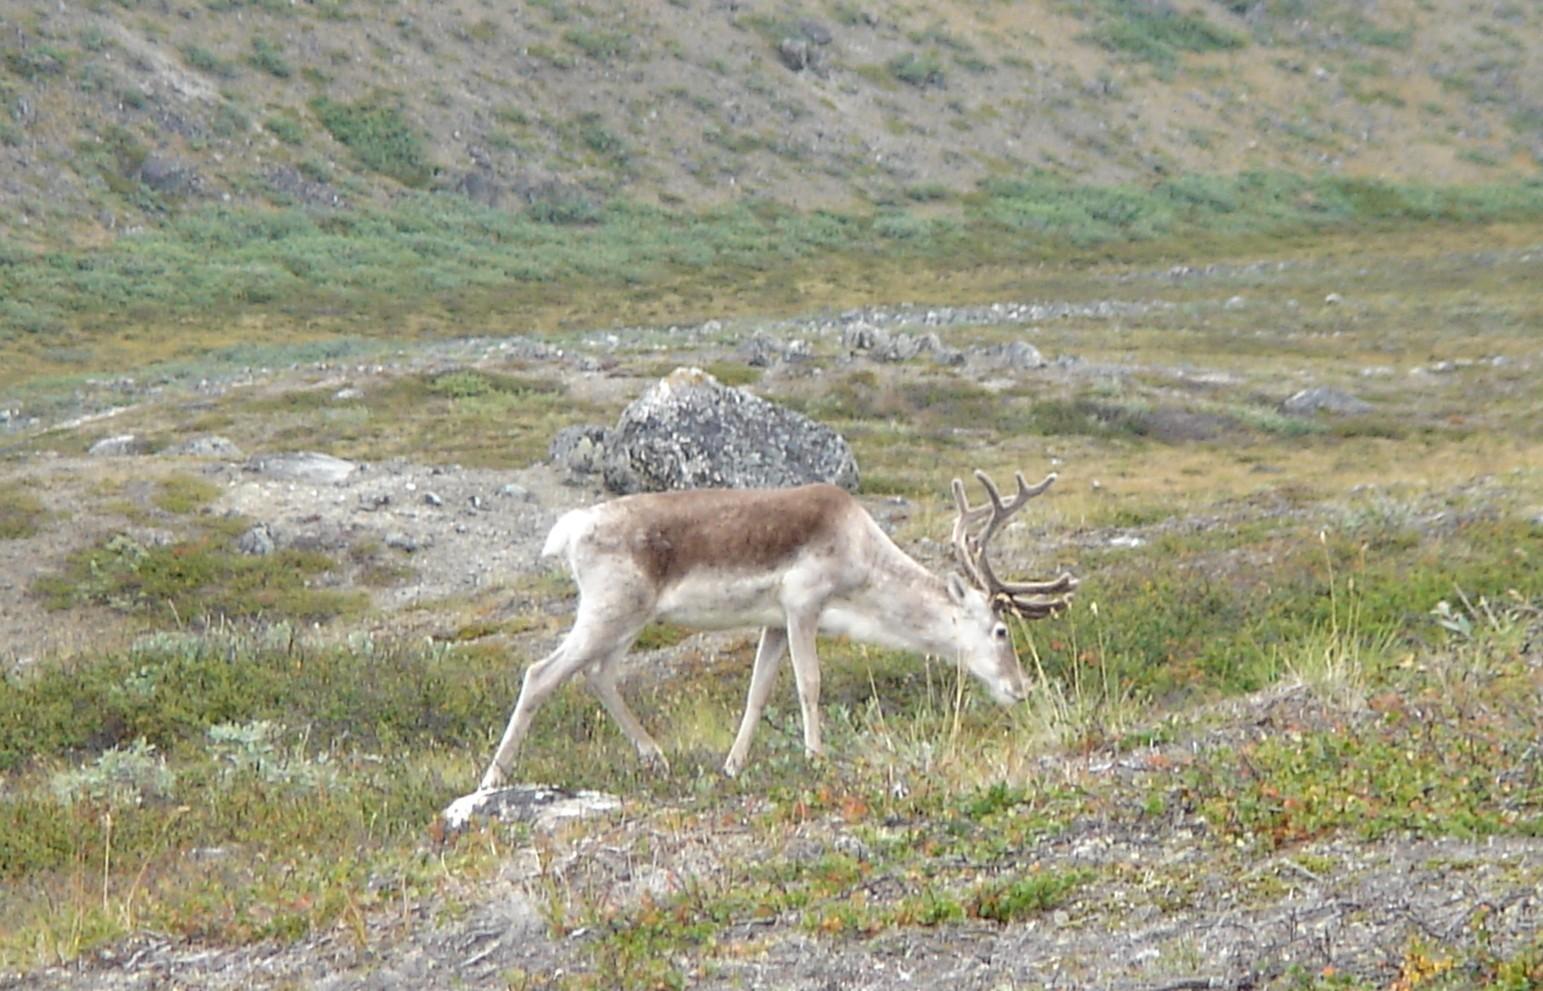 ULning-Greenland-young-reindeer-near-Aputitooq-mountain.JPG